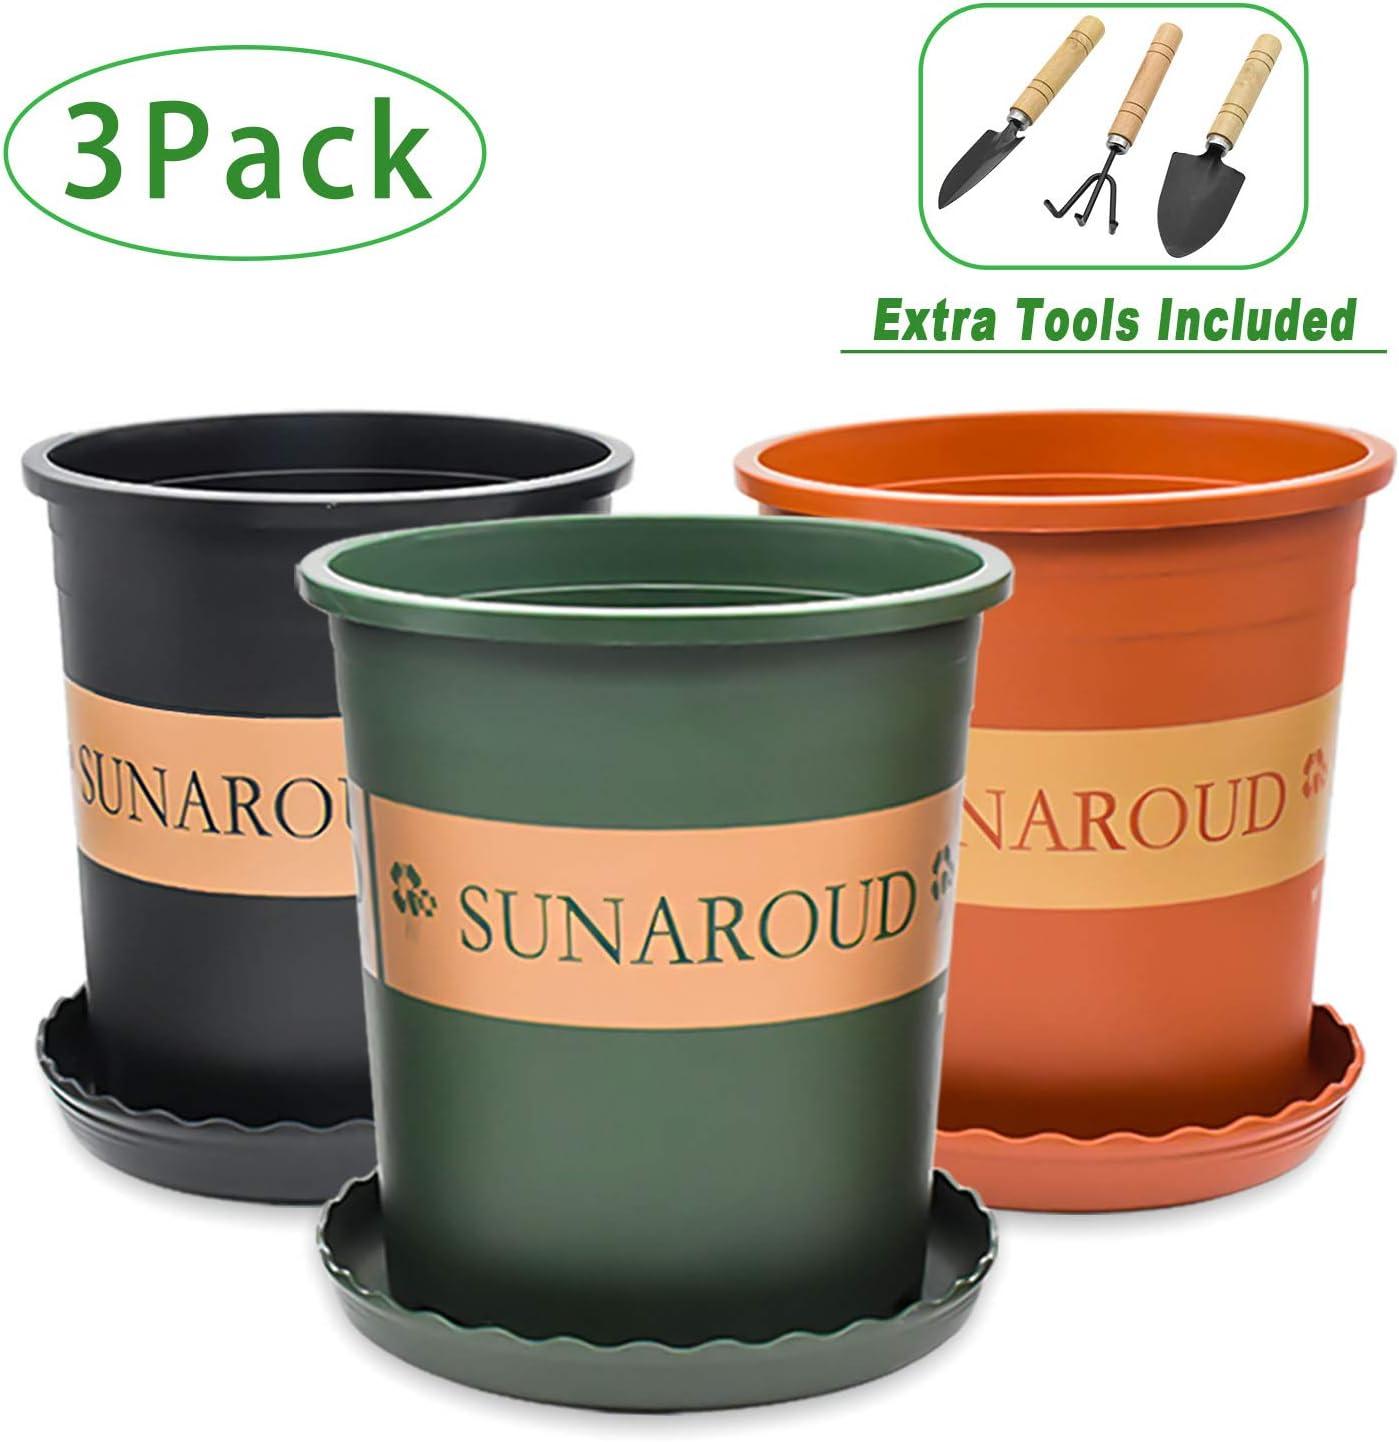 "Planter Nursery Garden Flower Pots (1 Gallon, 6.7"" Diameter) with Small Shovel Rake Spade,Plastic Plants Pots with Drainage,Set of 3(Terracotta Green Black)"